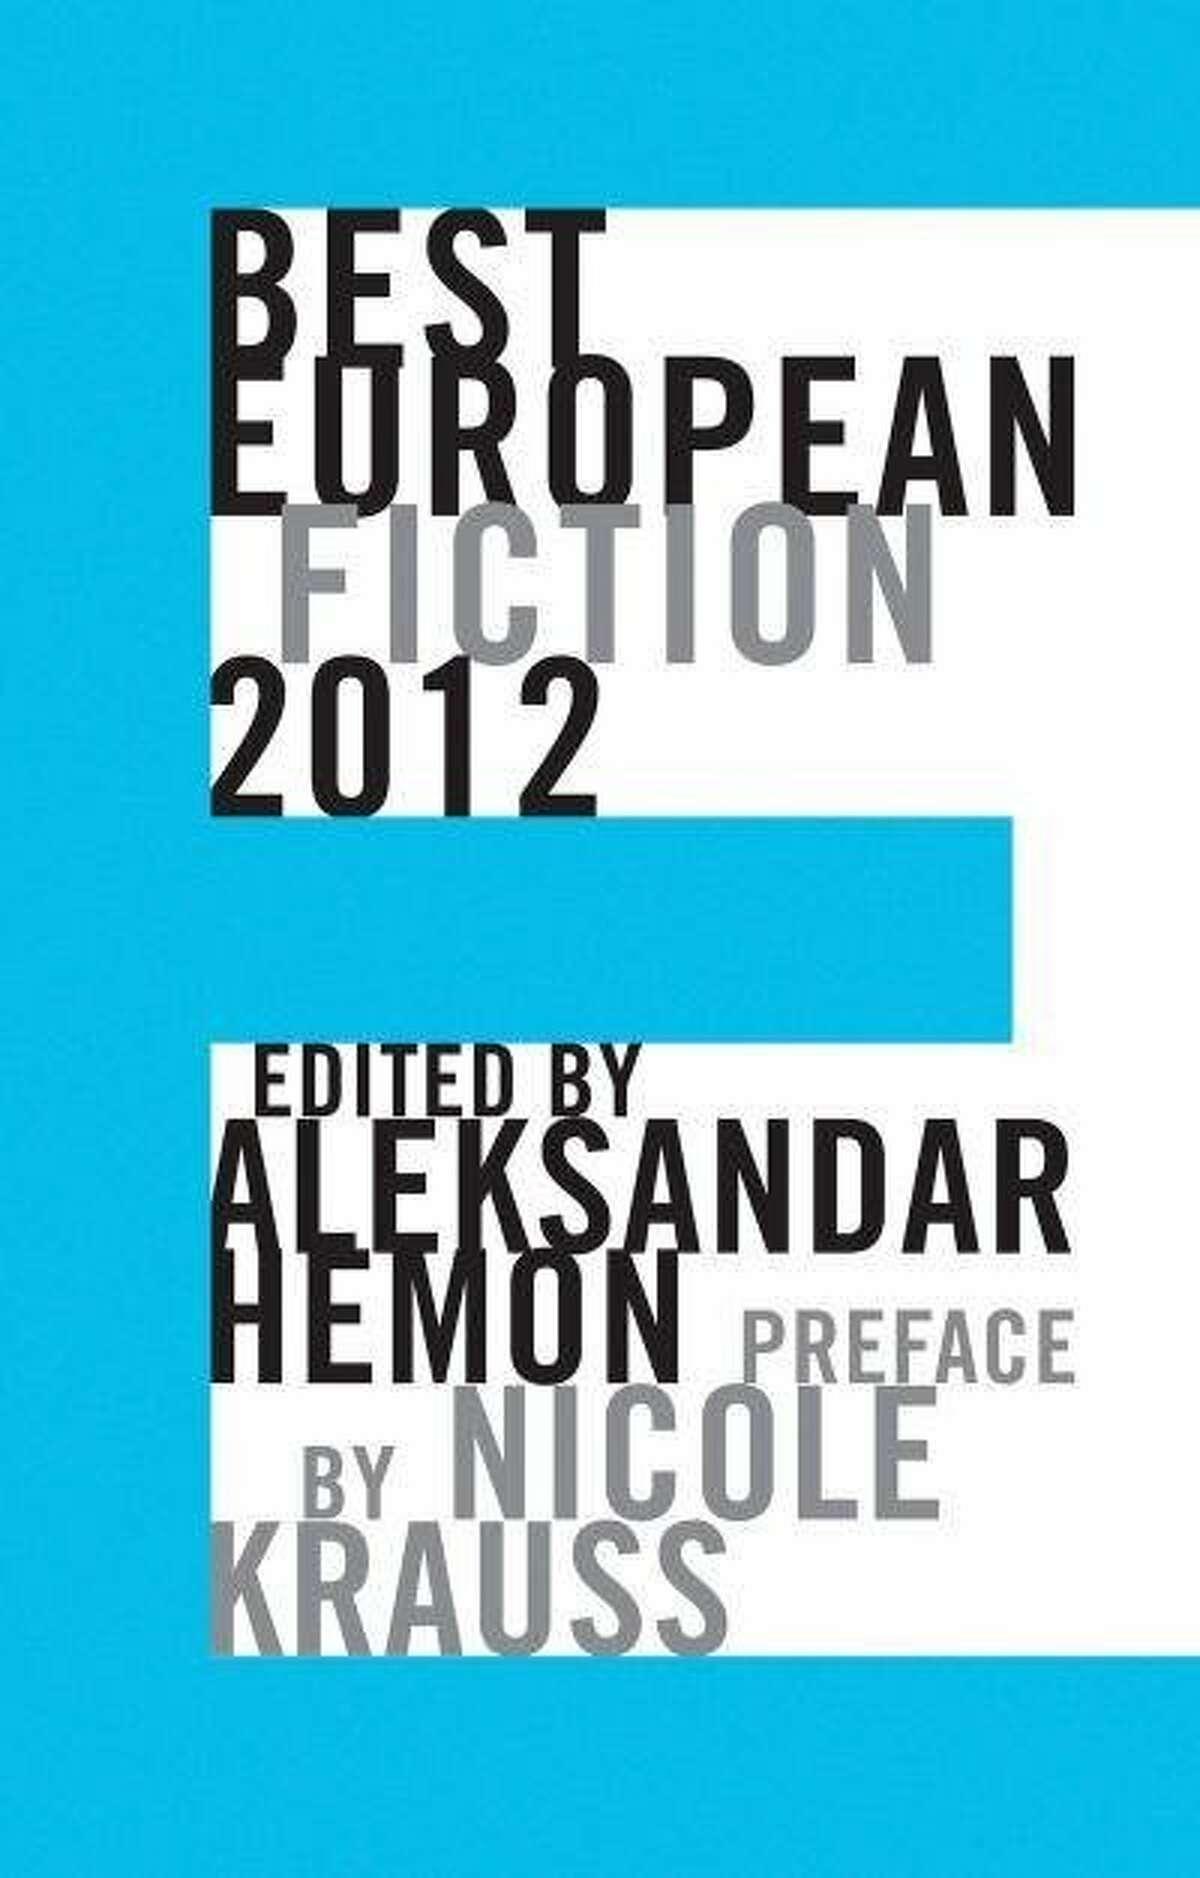 """Best European Fiction 2012"" Edited by Aleksandar Hemon"